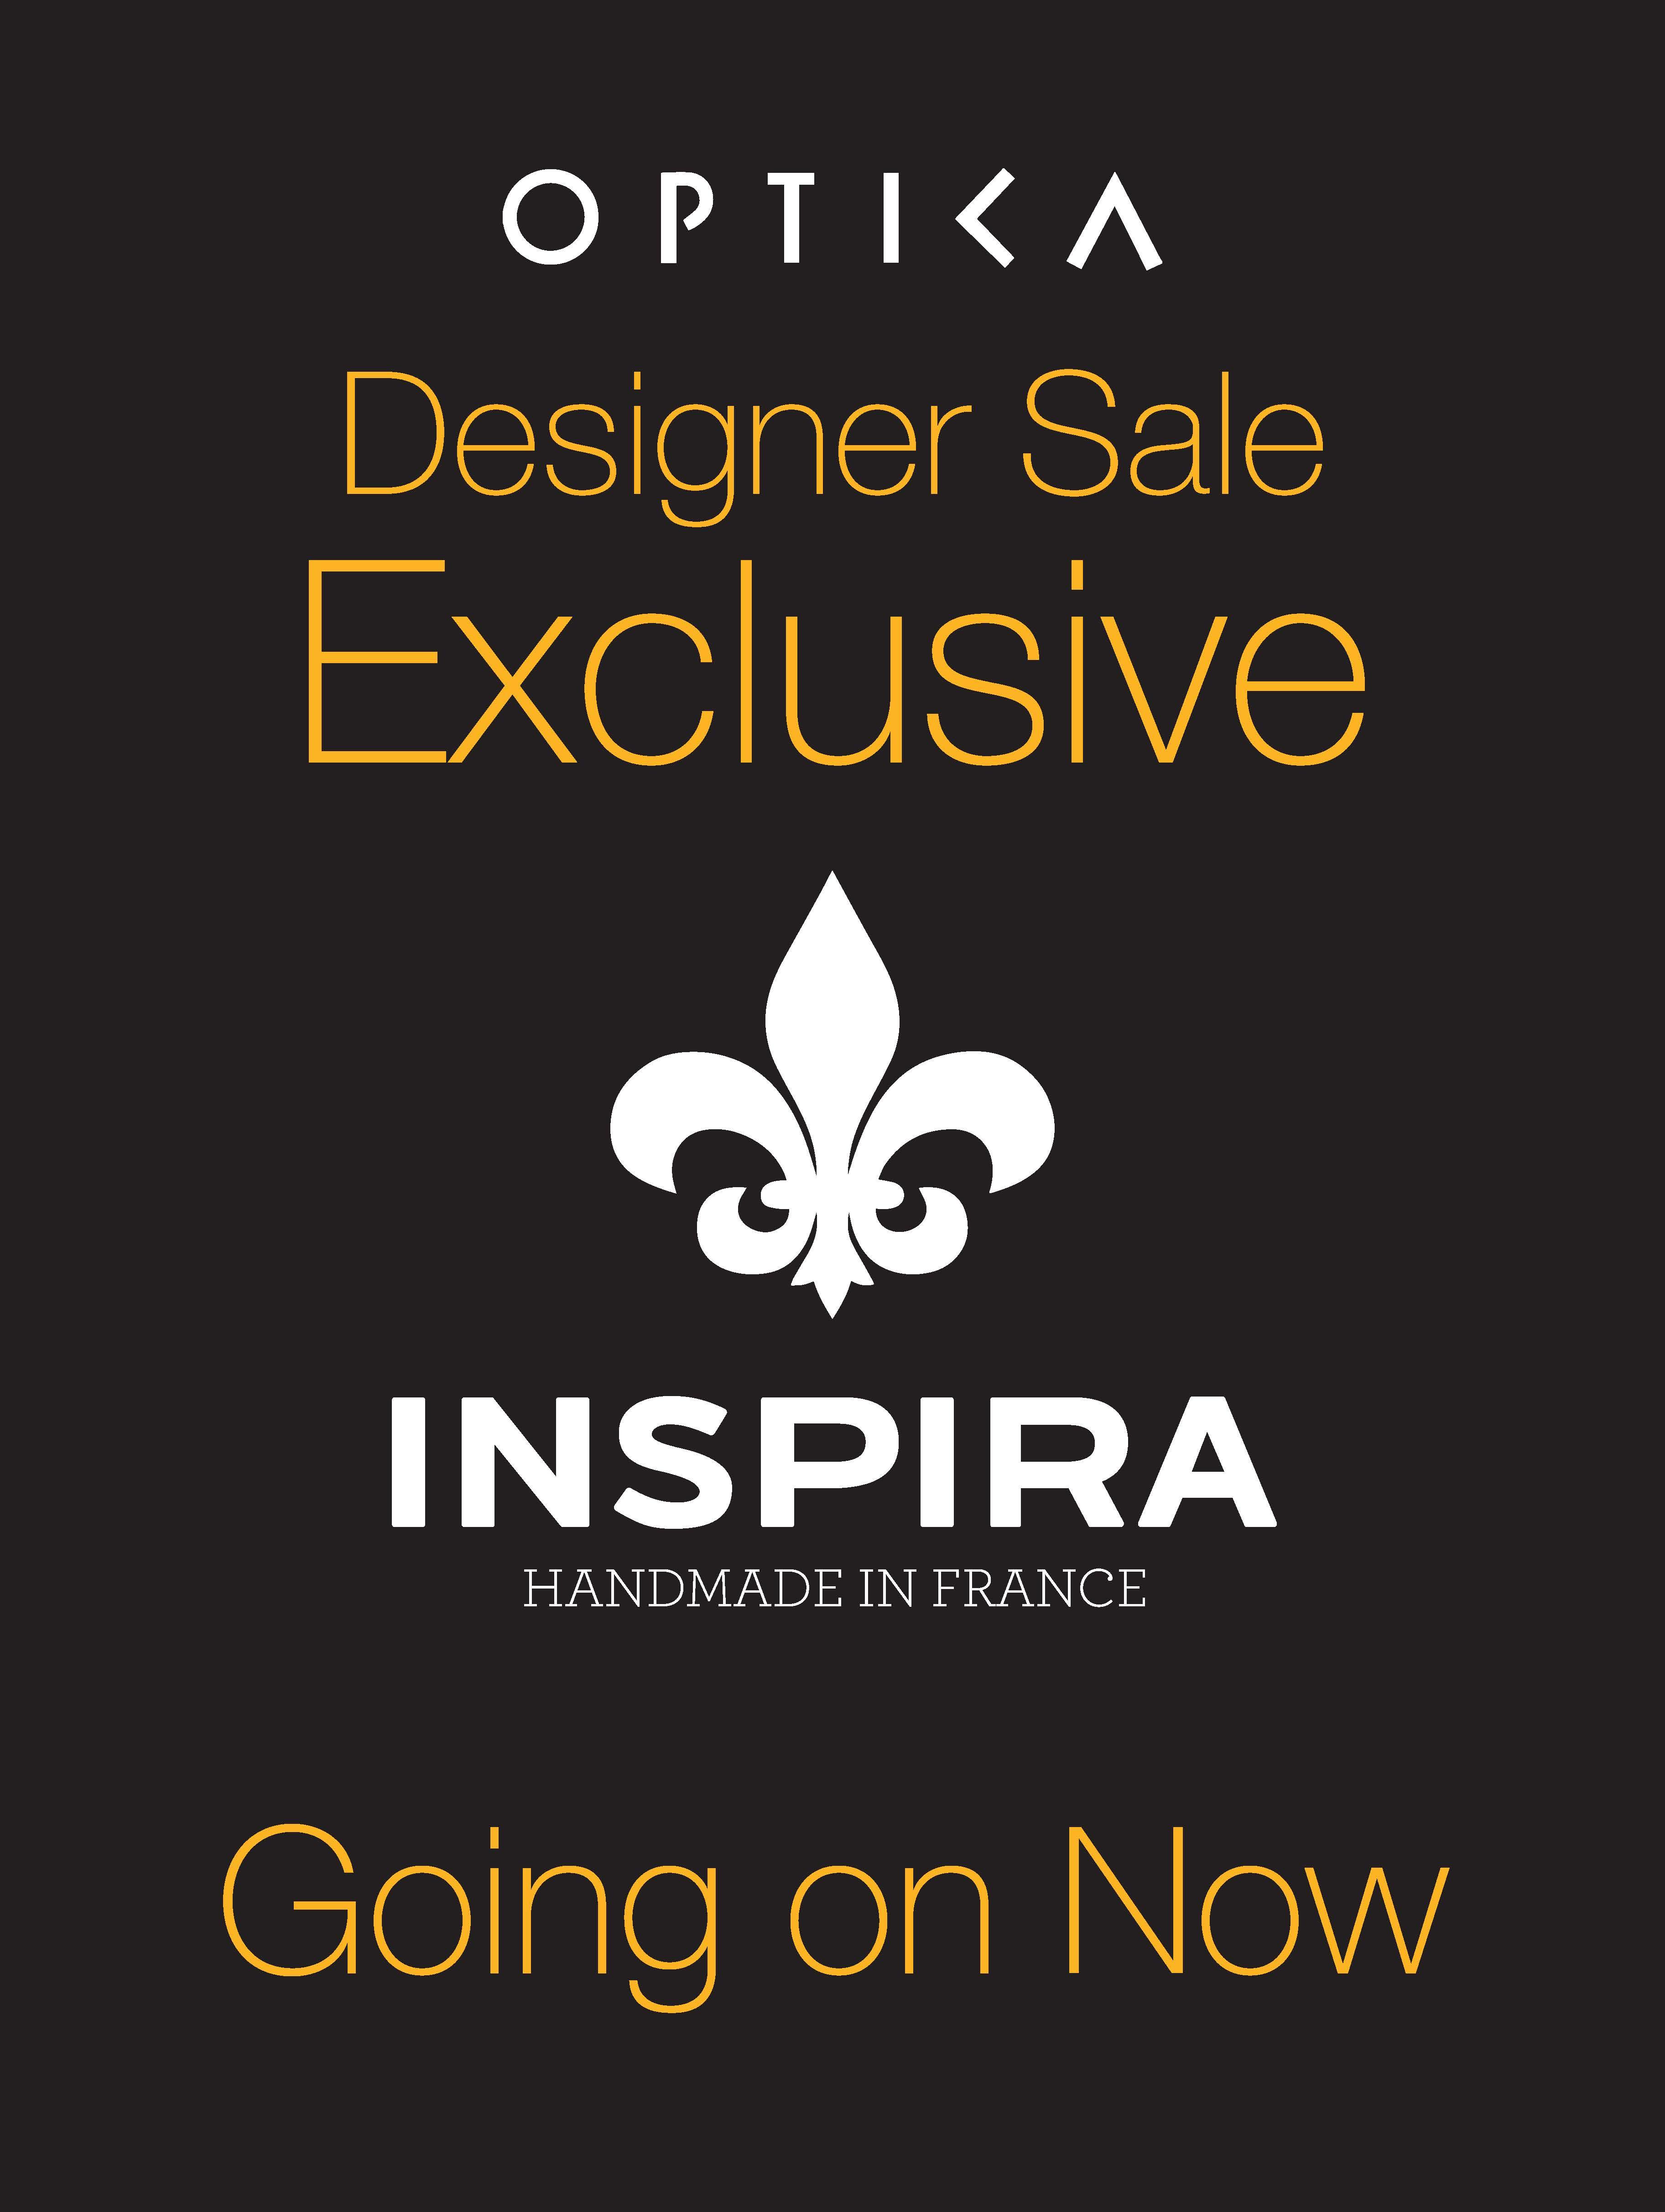 Exclusive Designer Sale on Inspira at Optica